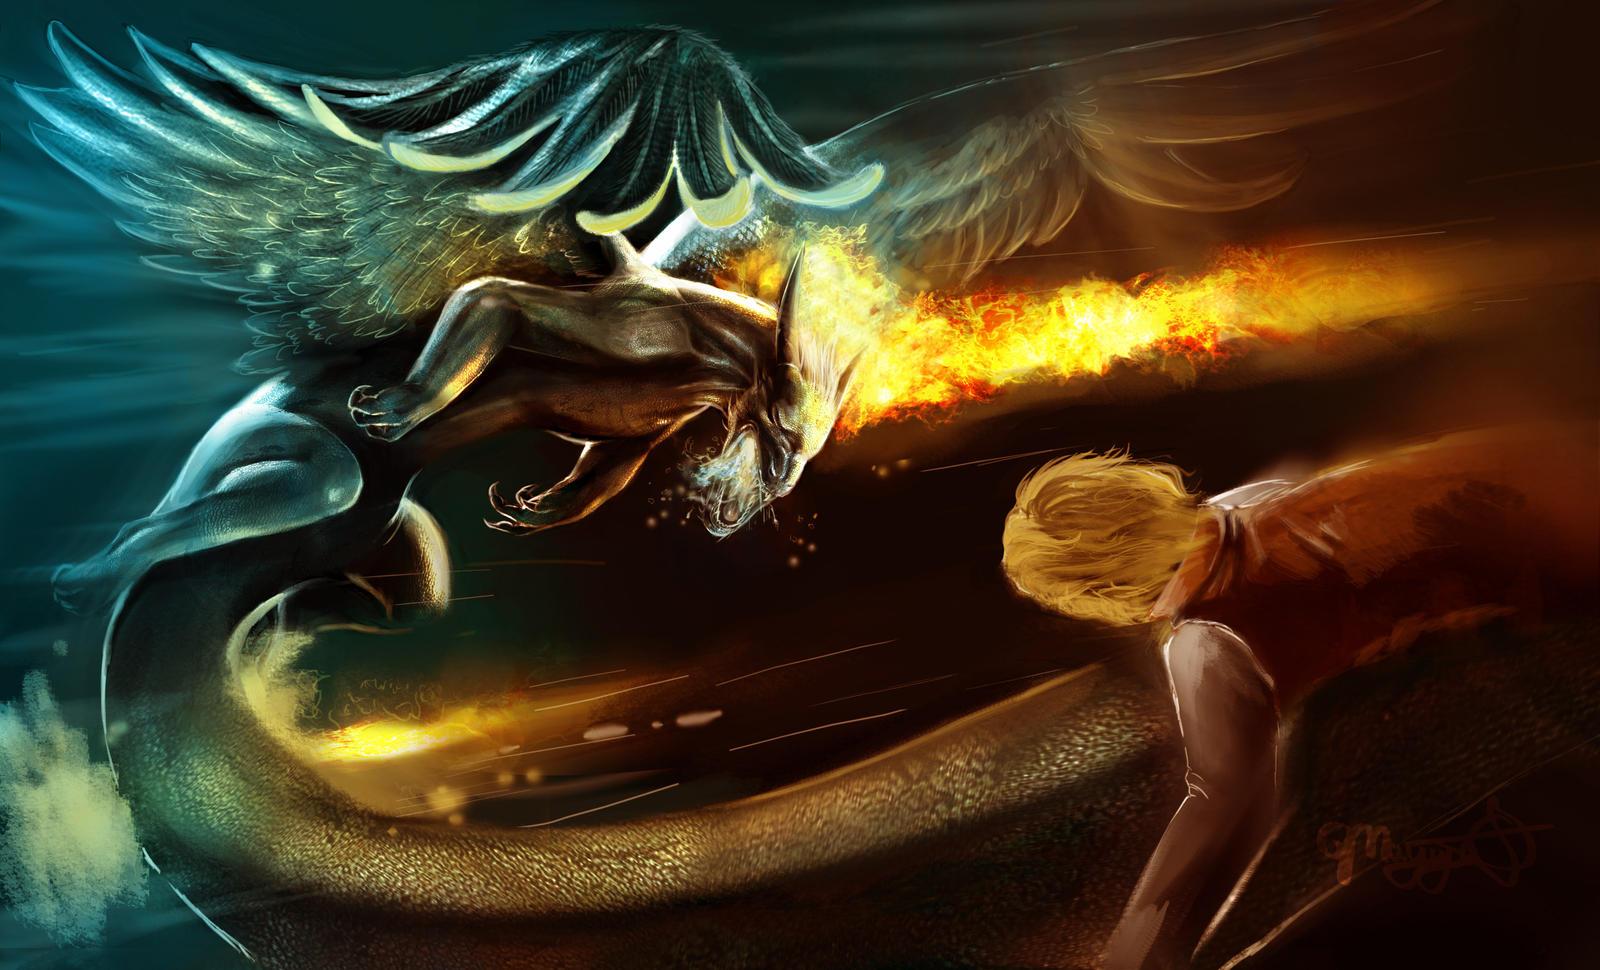 Saphira and Eragon to